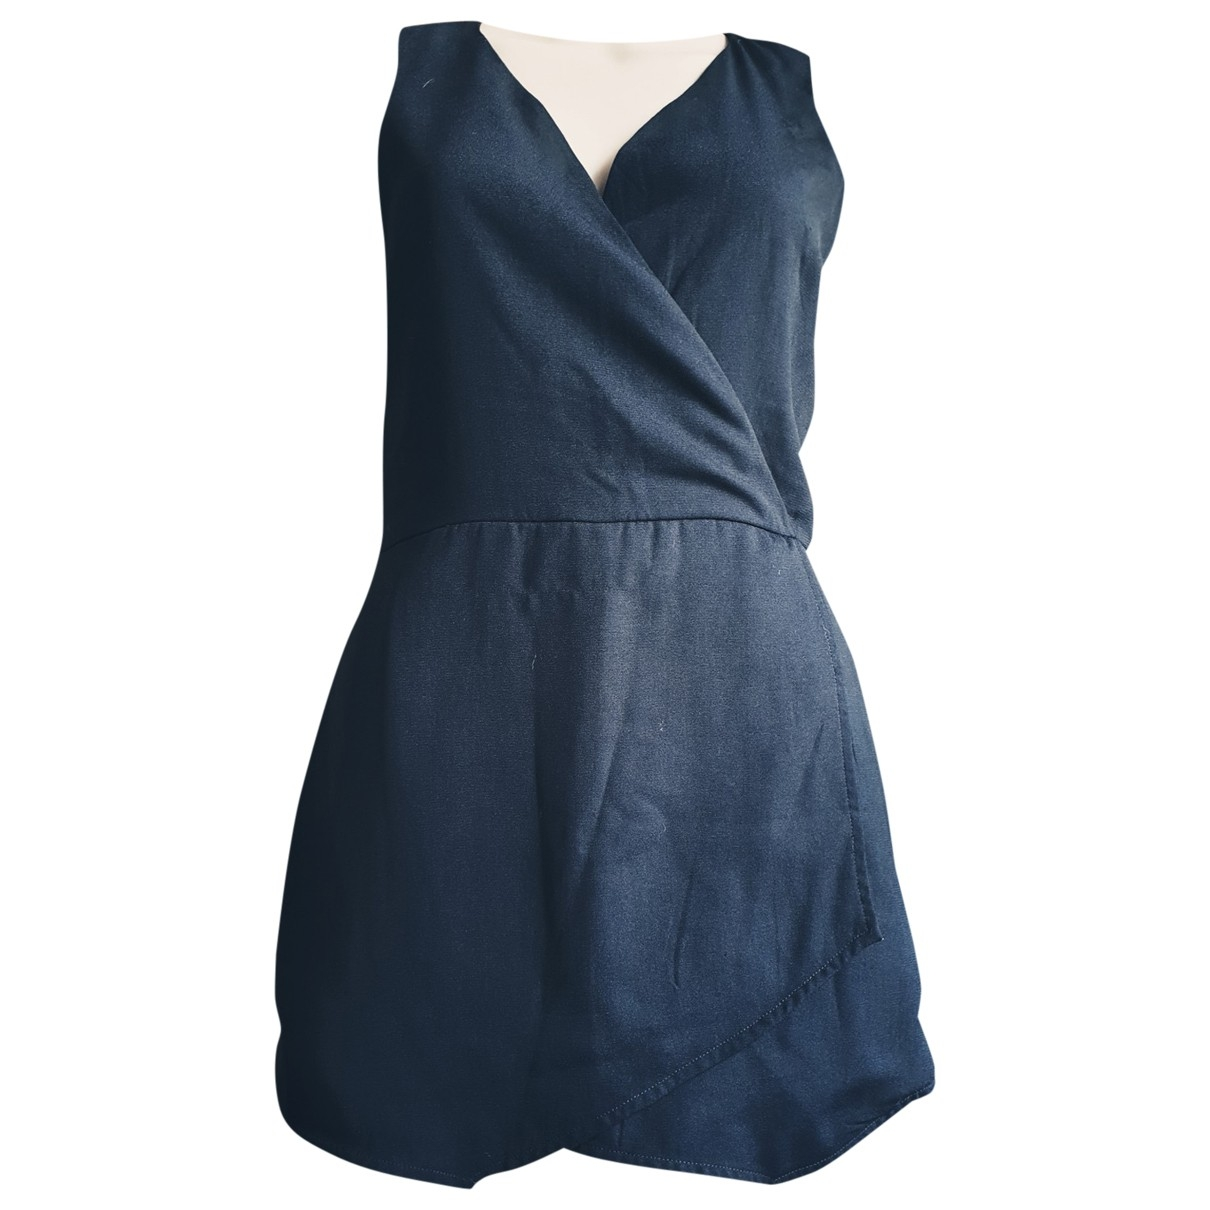 Abercrombie & Fitch \N Black dress for Women 38 FR